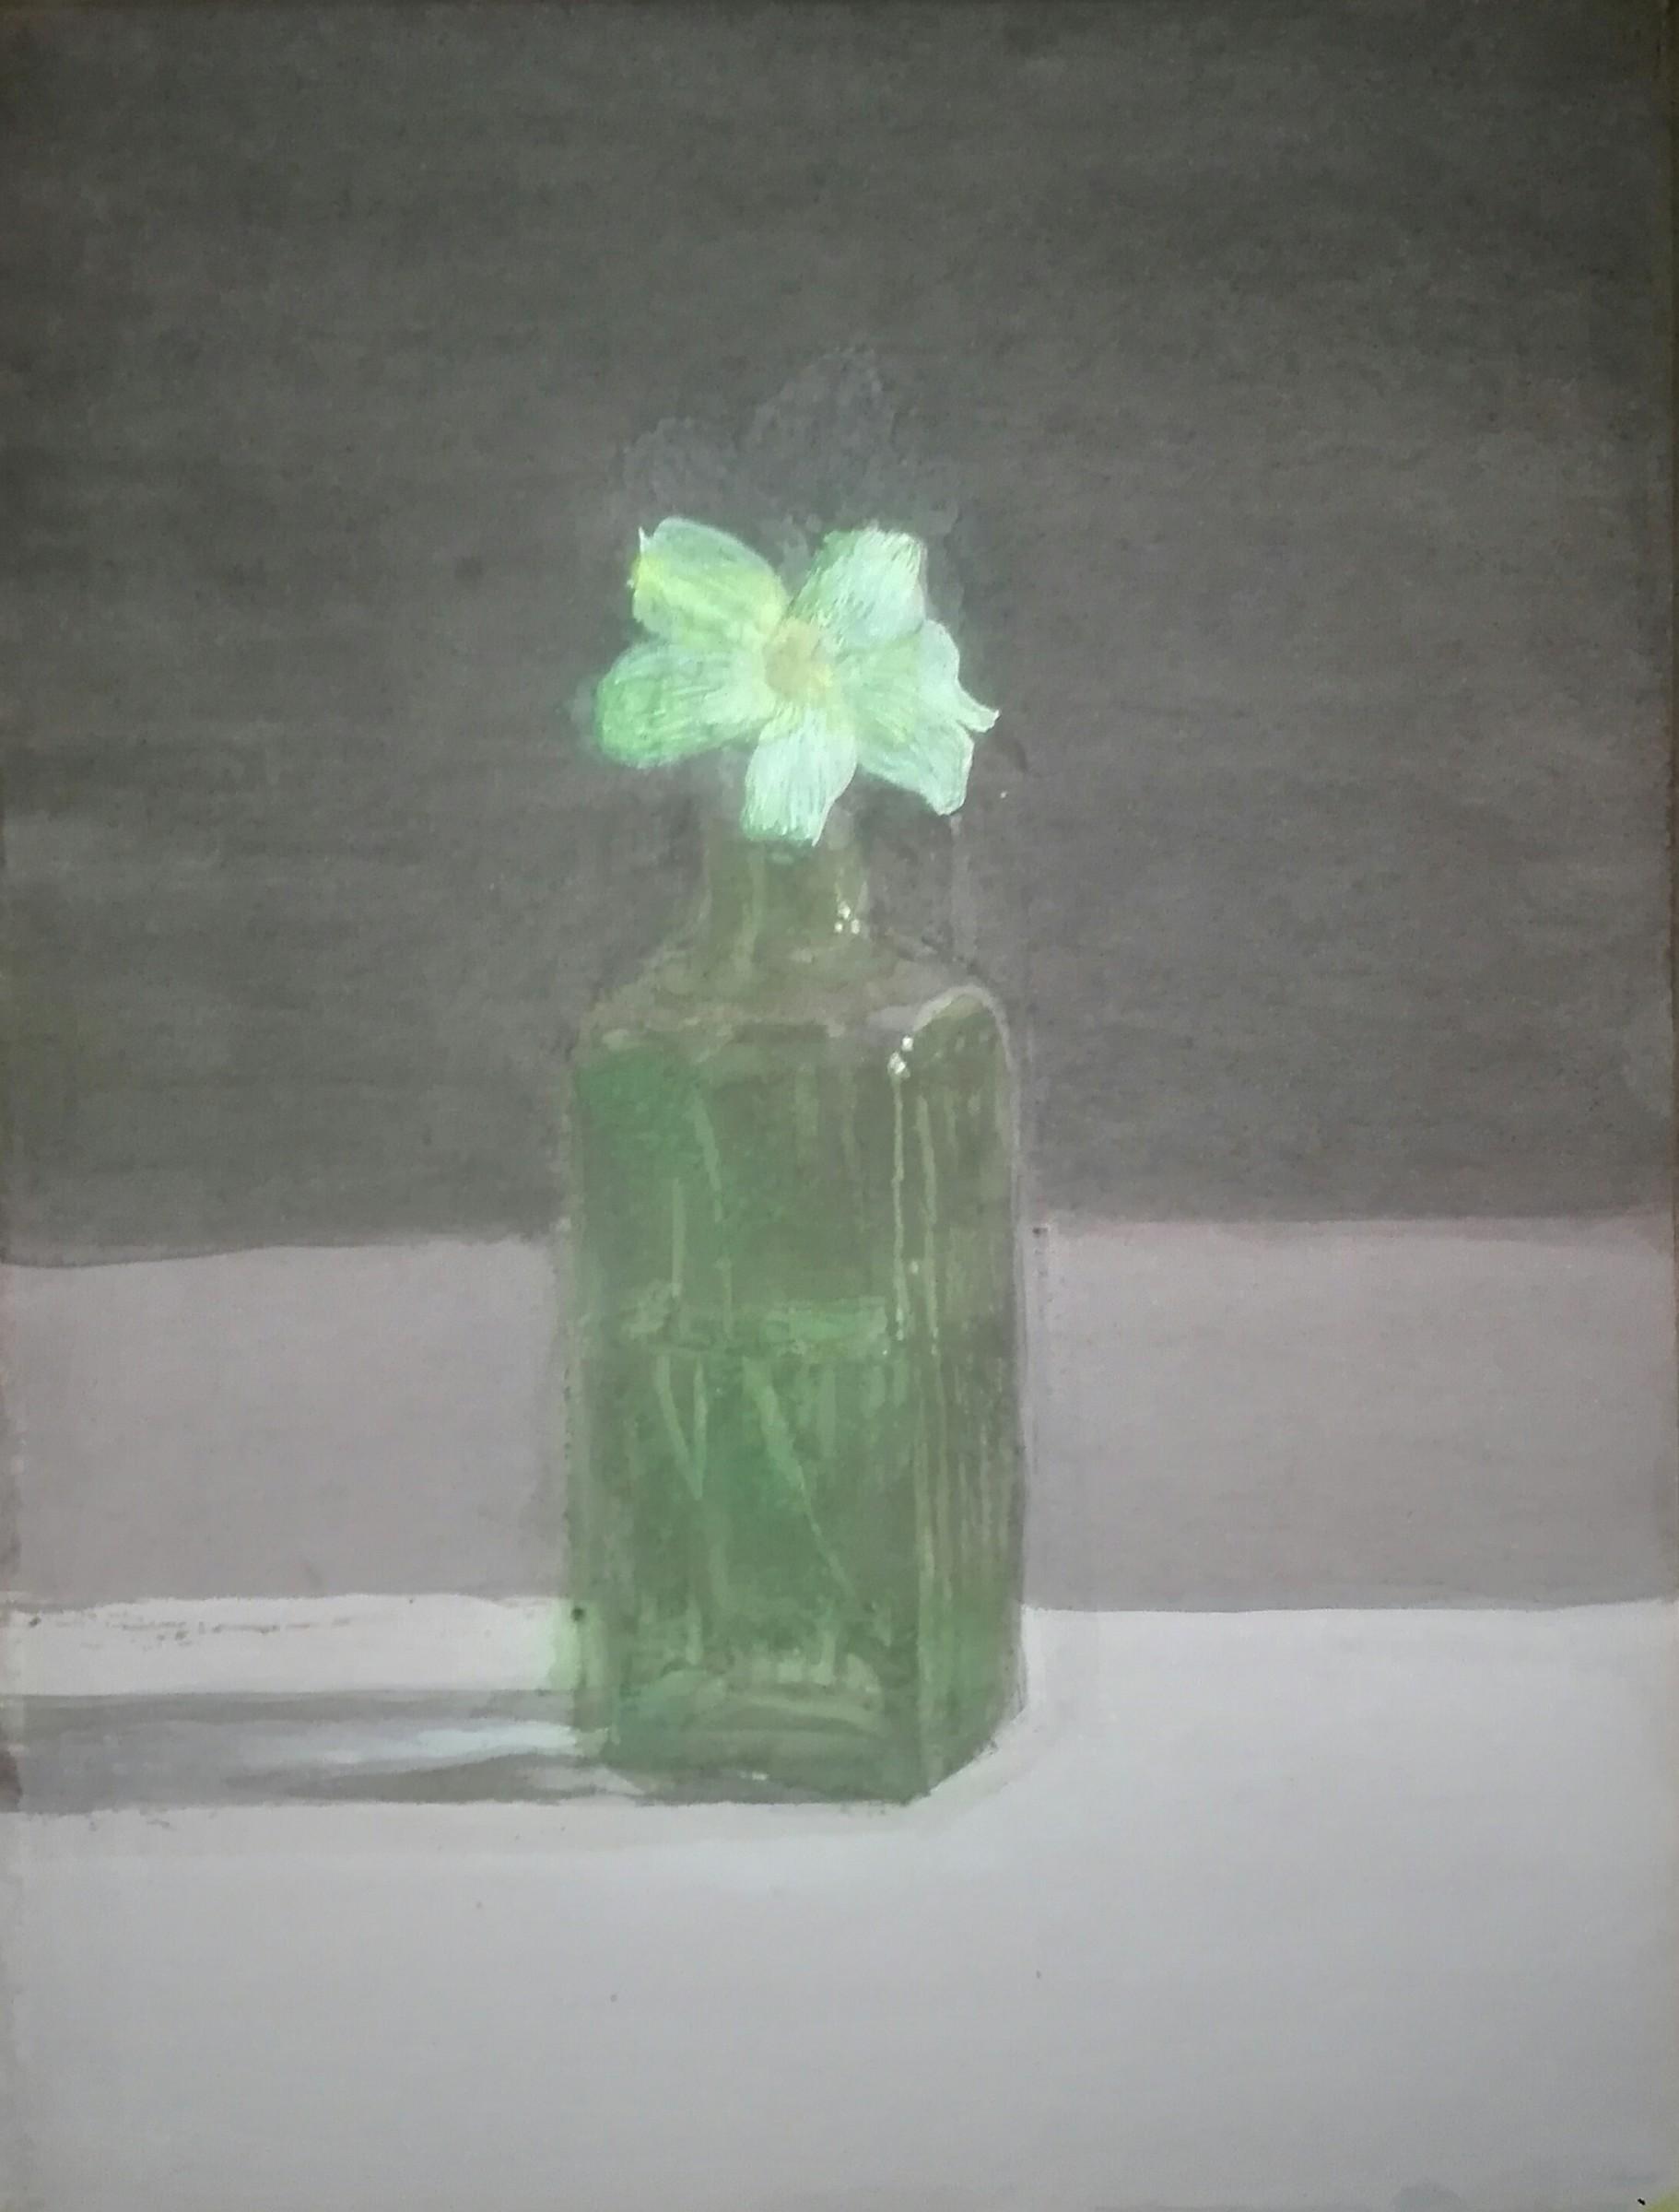 "<span class=""link fancybox-details-link""><a href=""/artists/61-cameron-galt/works/11522-cameron-galt-poison-green/"">View Detail Page</a></span><div class=""artist""><span class=""artist""><strong>Cameron Galt</strong></span></div><div class=""title""><em>Poison Green</em></div><div class=""medium"">watercolour</div>"